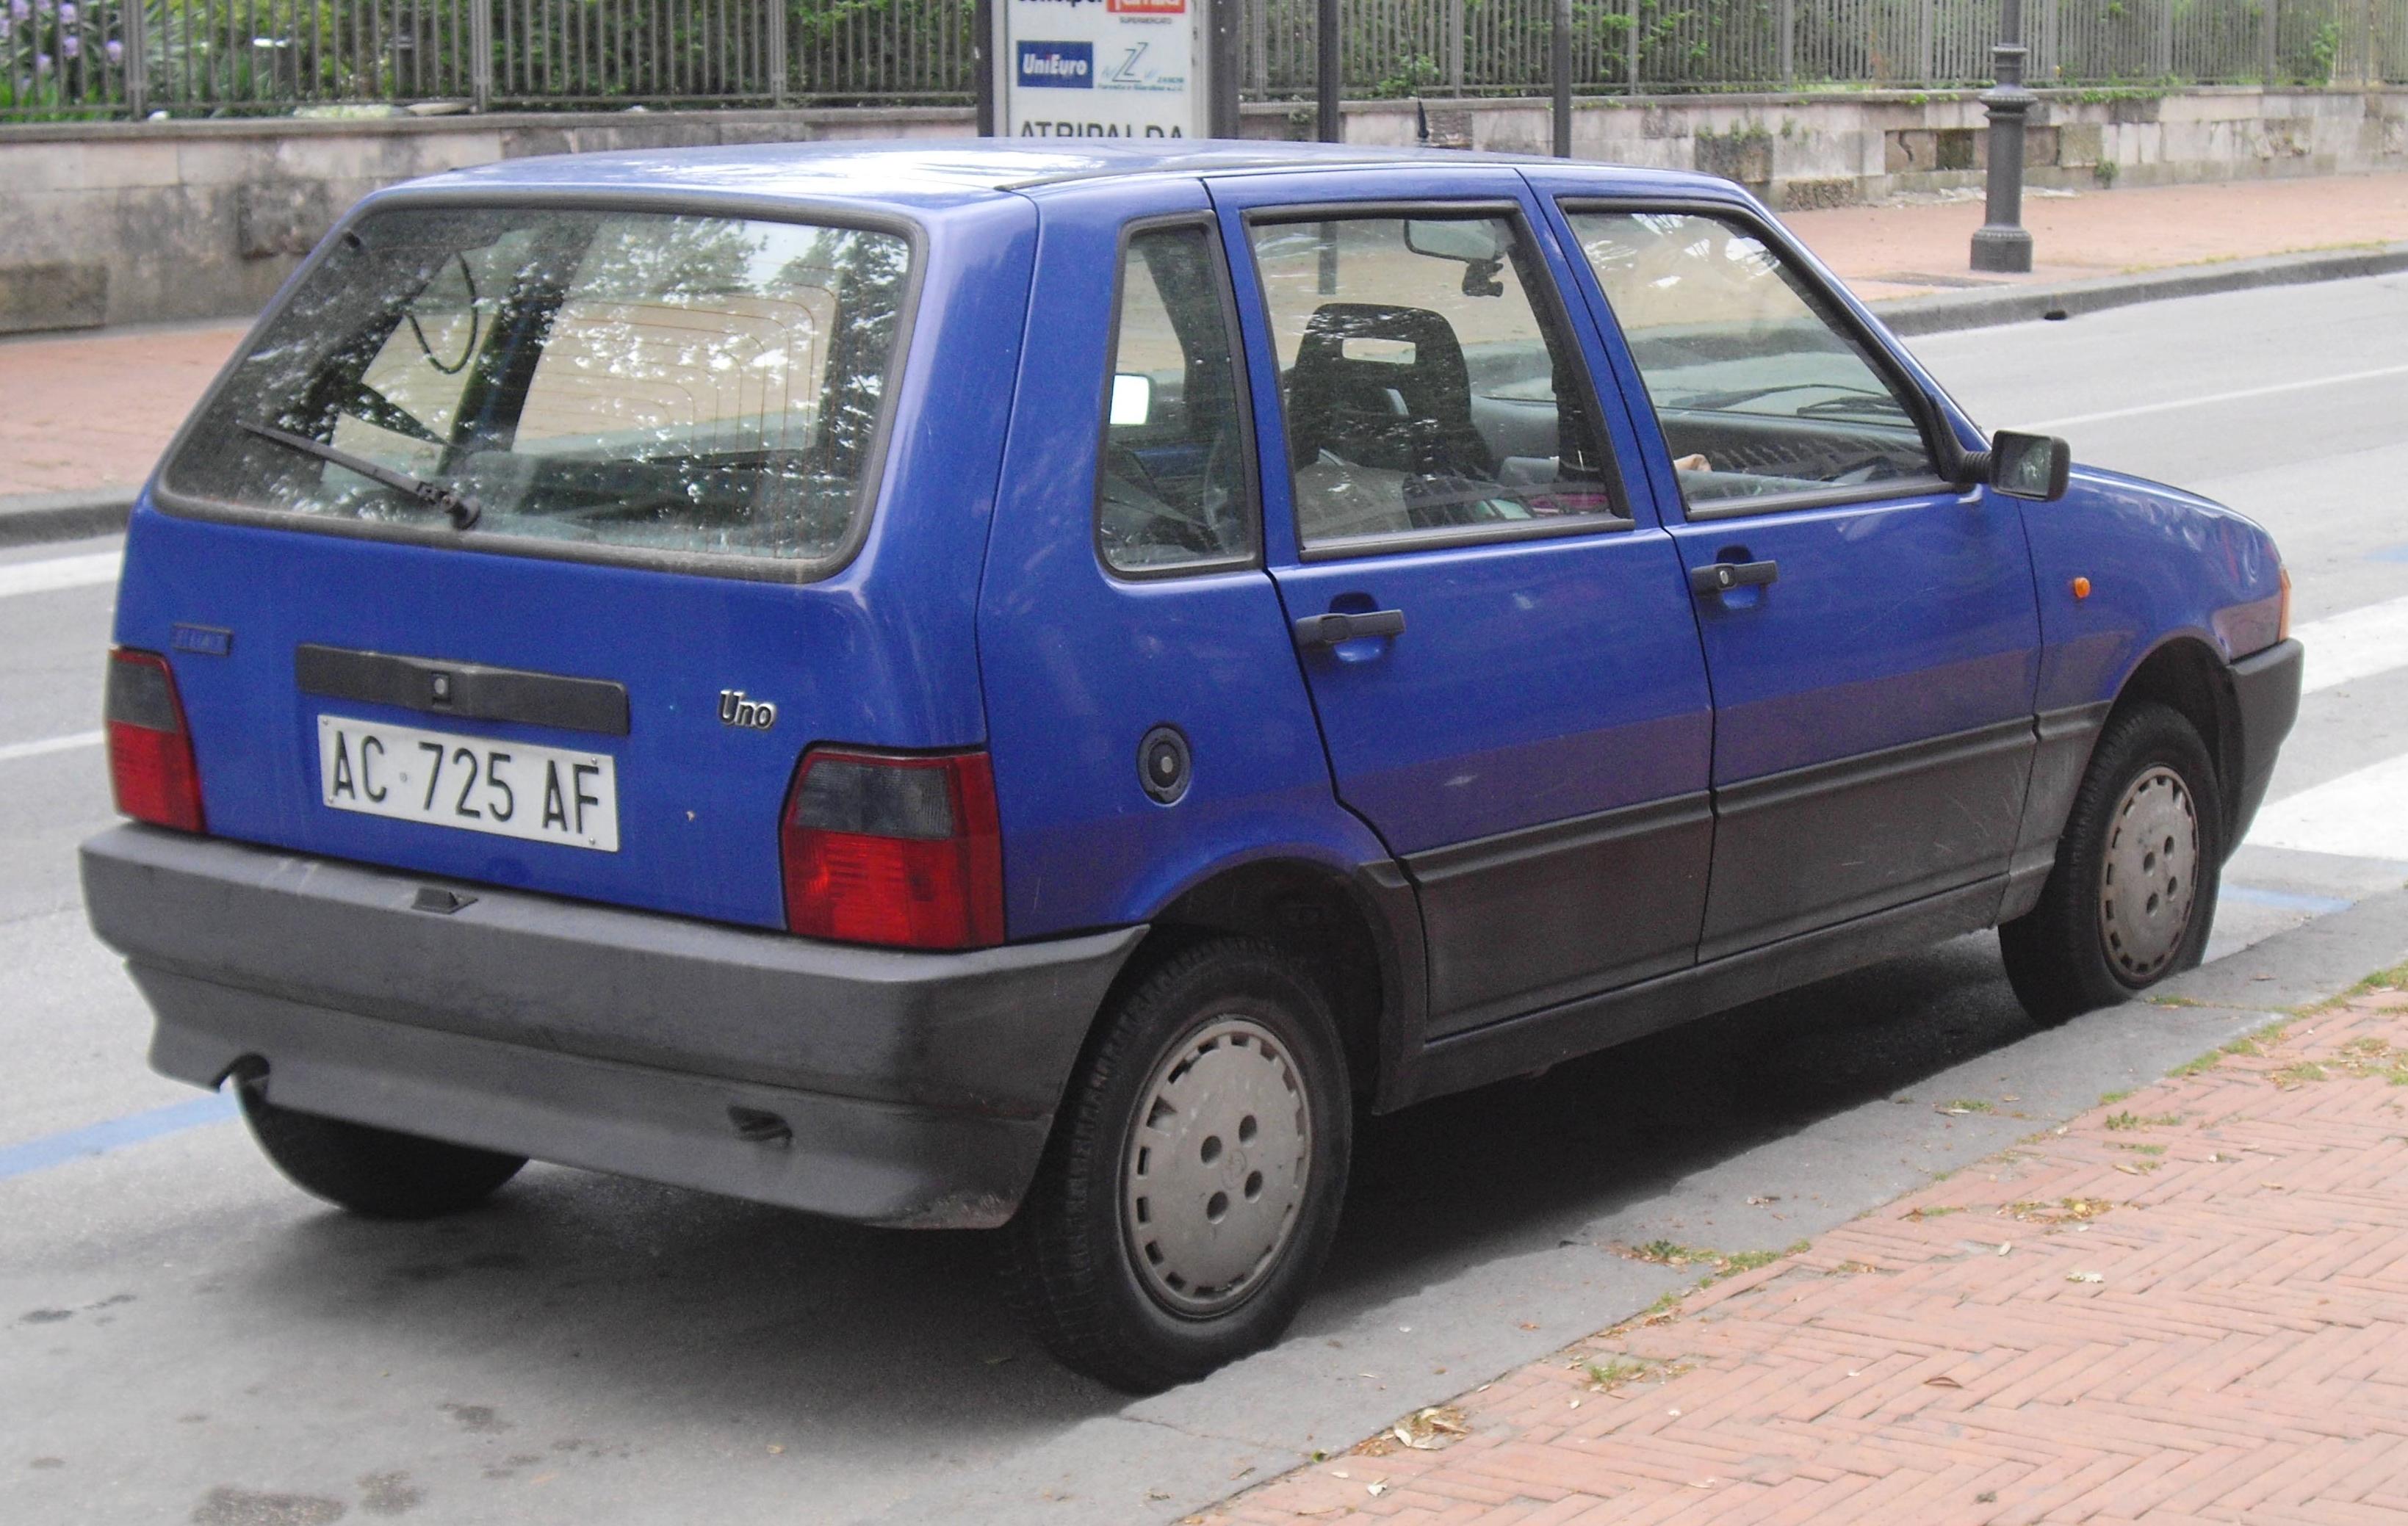 http://upload.wikimedia.org/wikipedia/commons/9/9d/Fiat_Uno_facelift_5-door.JPG